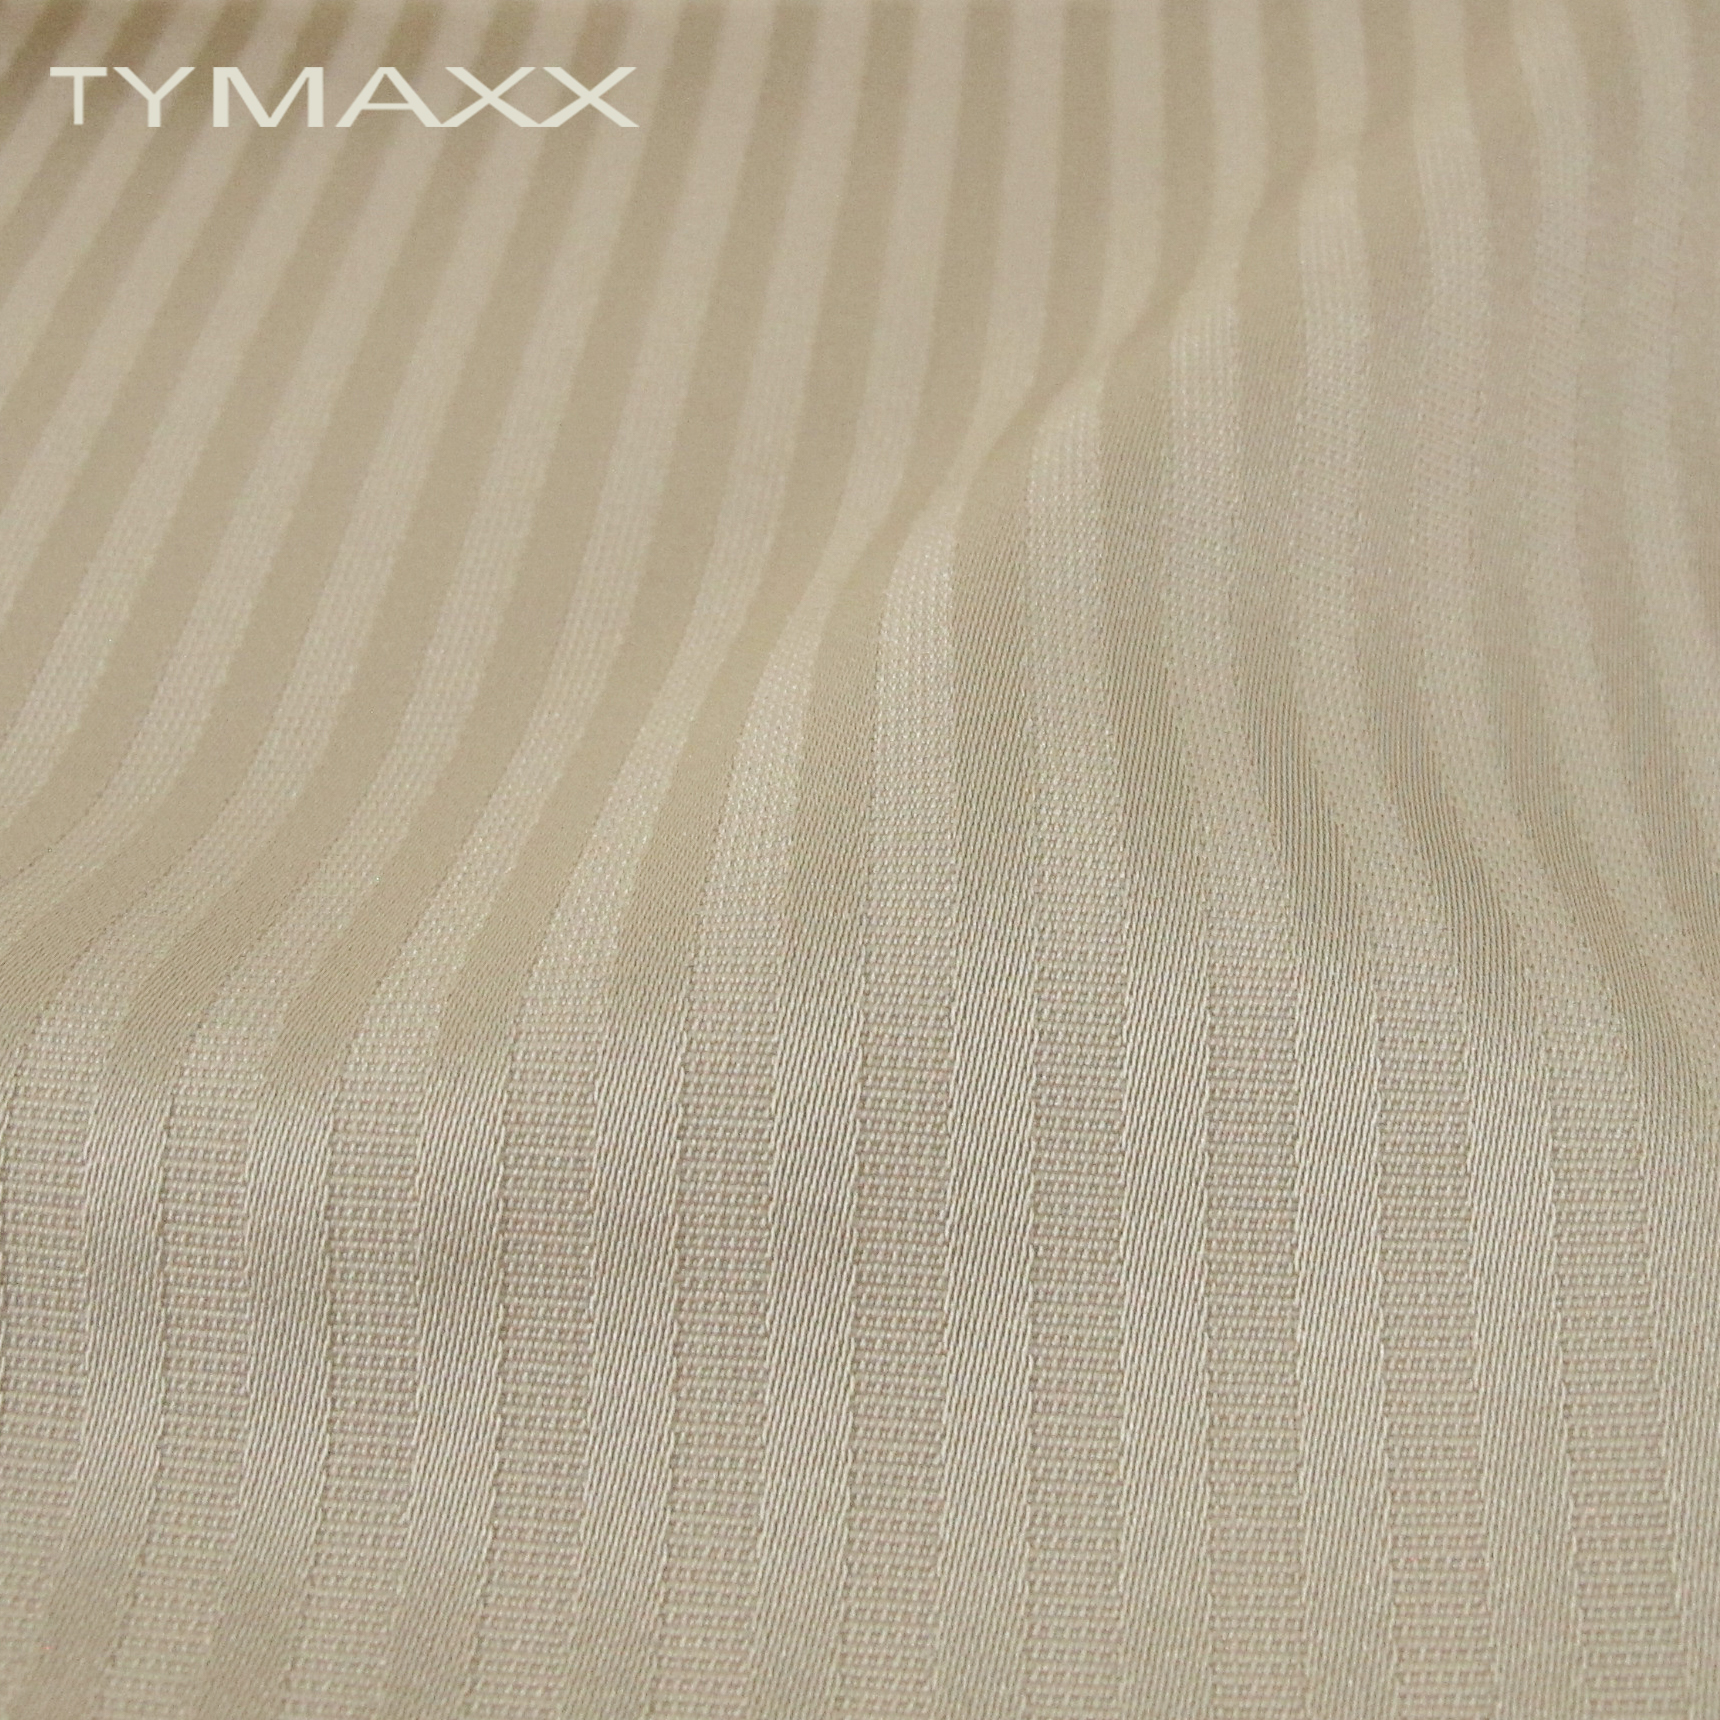 Stripe Flame Retardant Fabric Shiny Curtain Drapery - Buy Fire Retardant  Drapery Fabric,Silk Like Brocade Fabric,Brocade Jacquard Fabric Product on